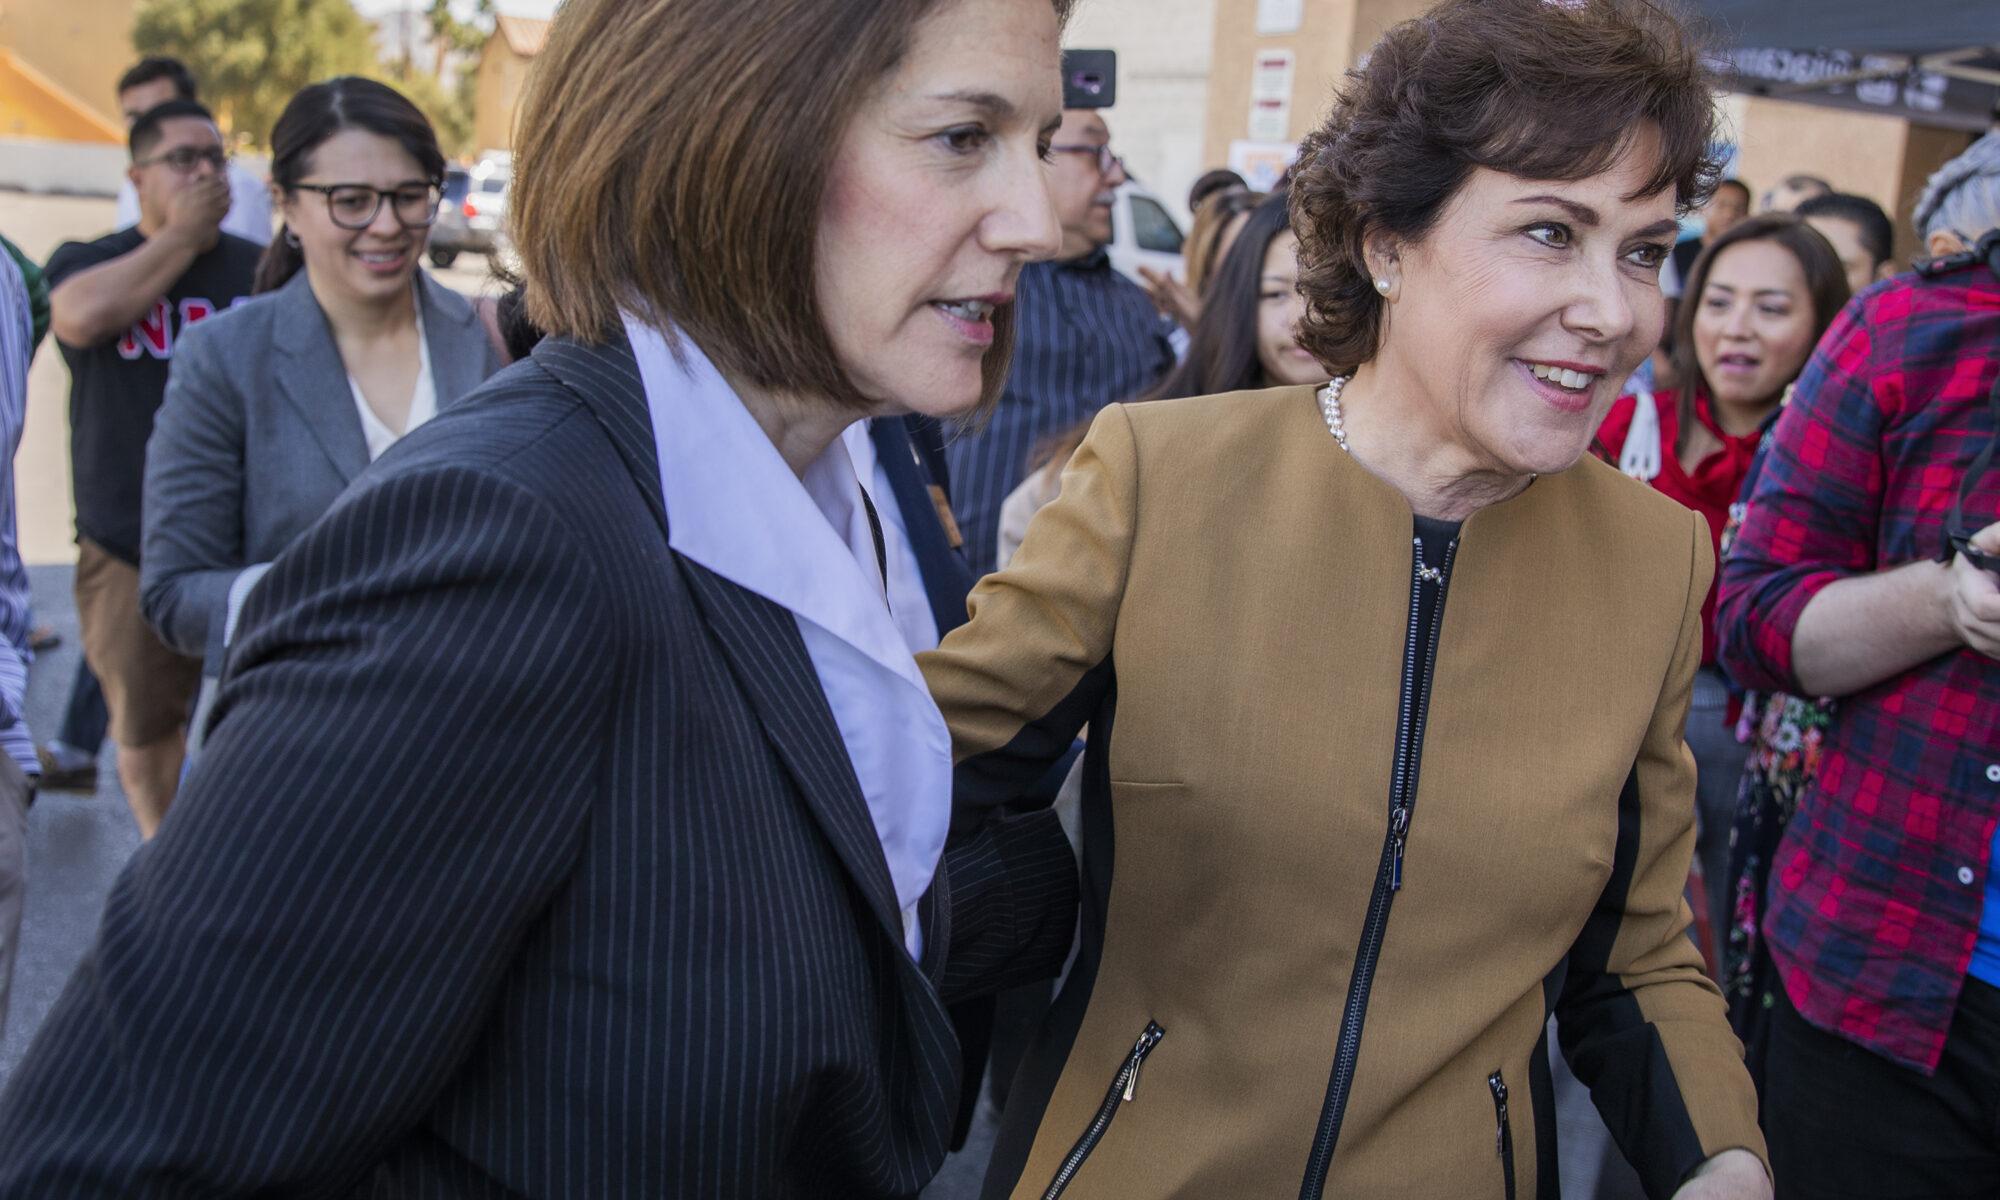 Catherine Cortez Masto, left, (D-Nev.) and Congresswoman Jacky Rosen